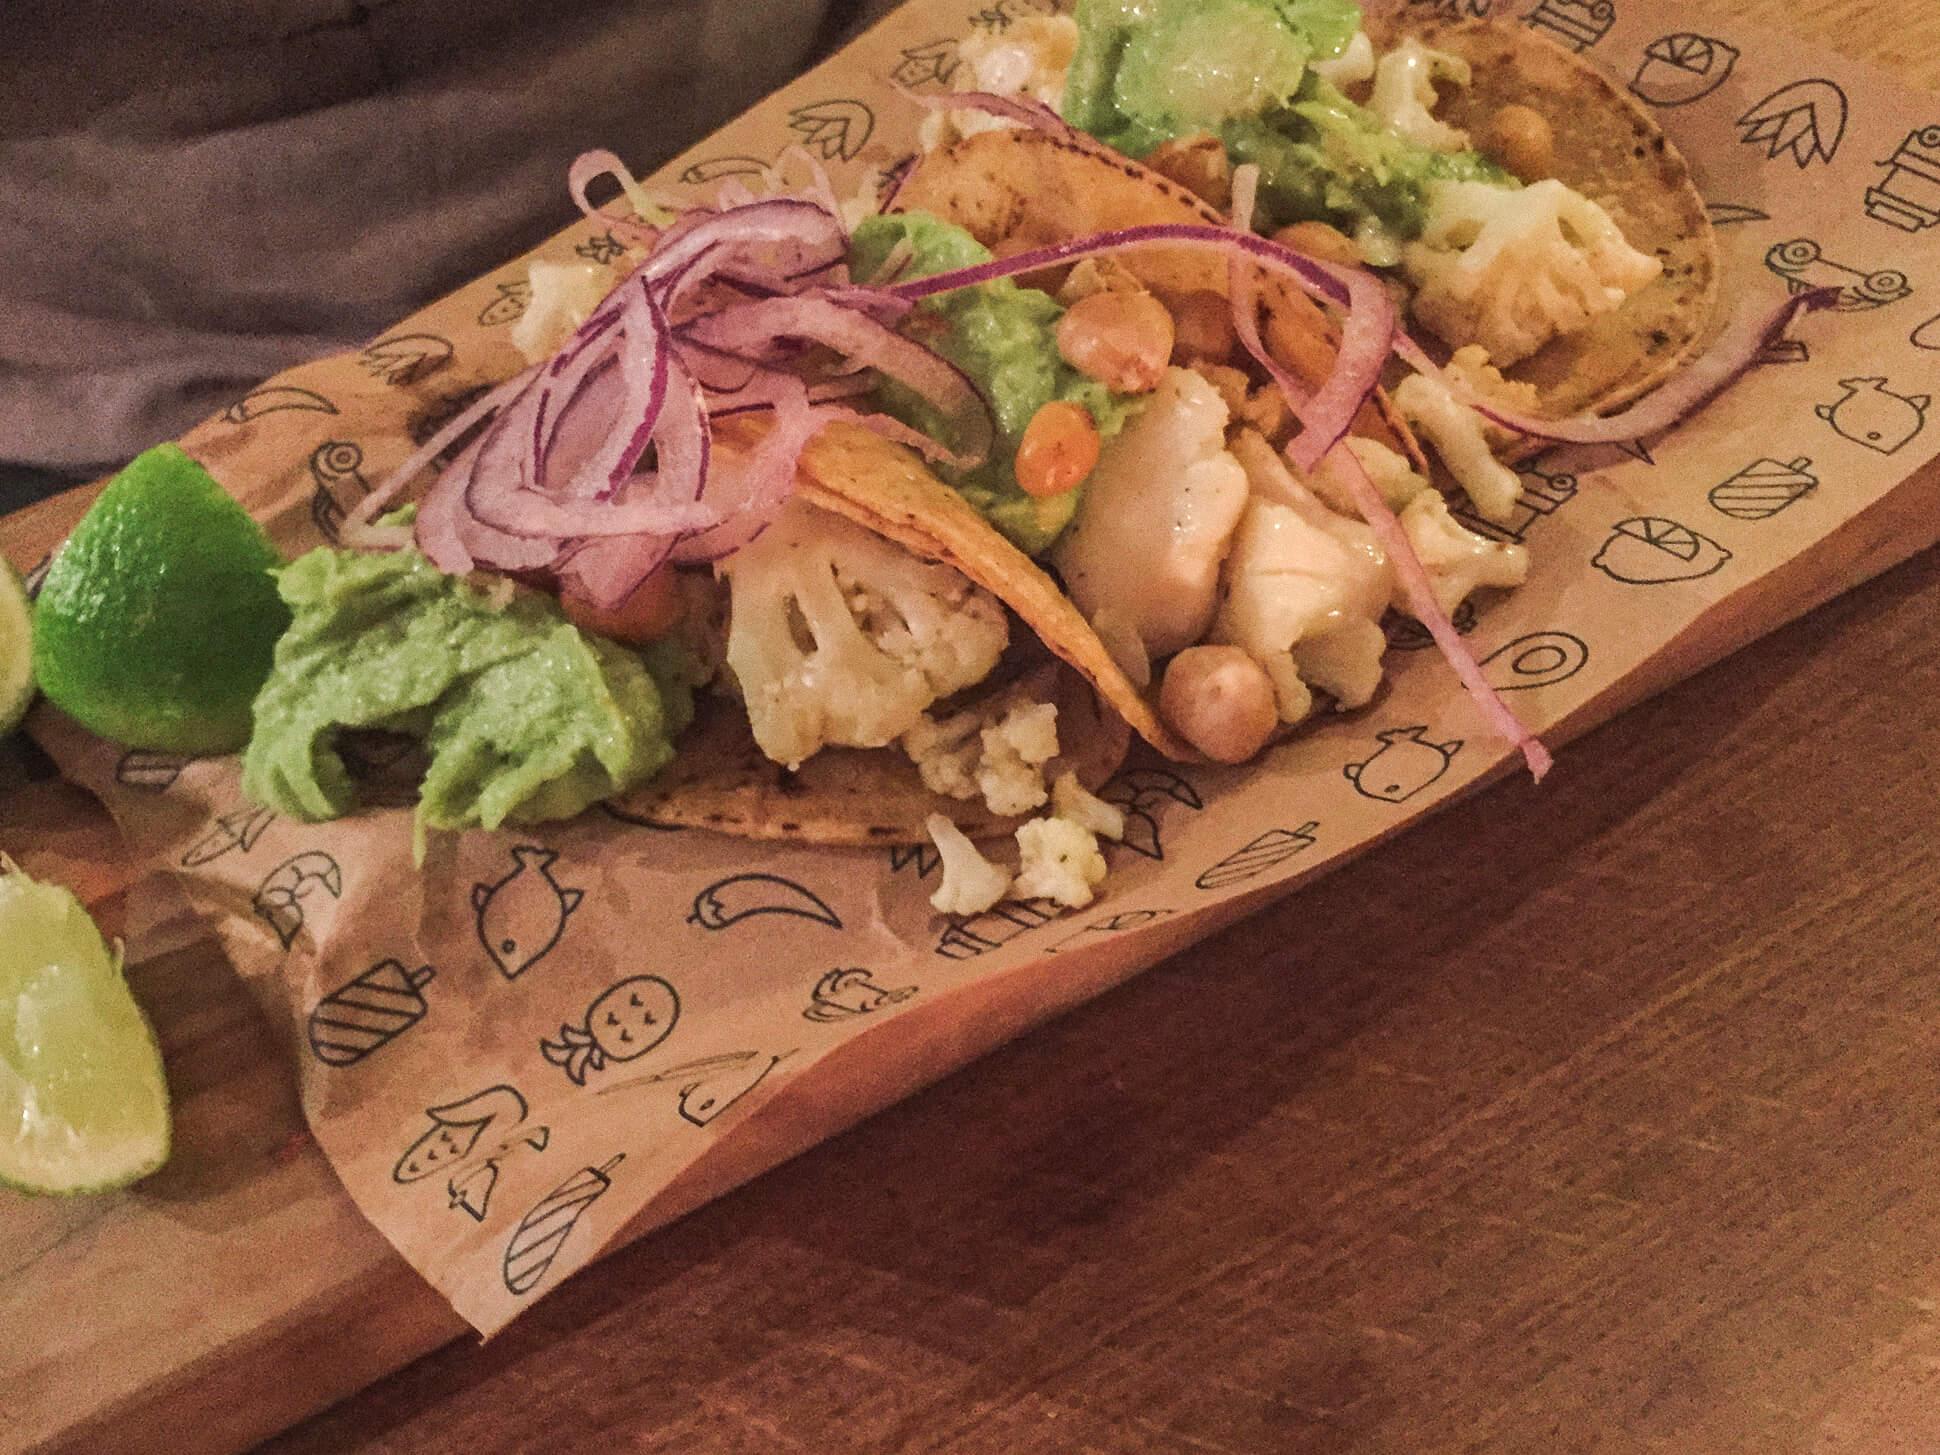 Mexiko Straße - mexikanische Küche in Hamburg St. Pauli